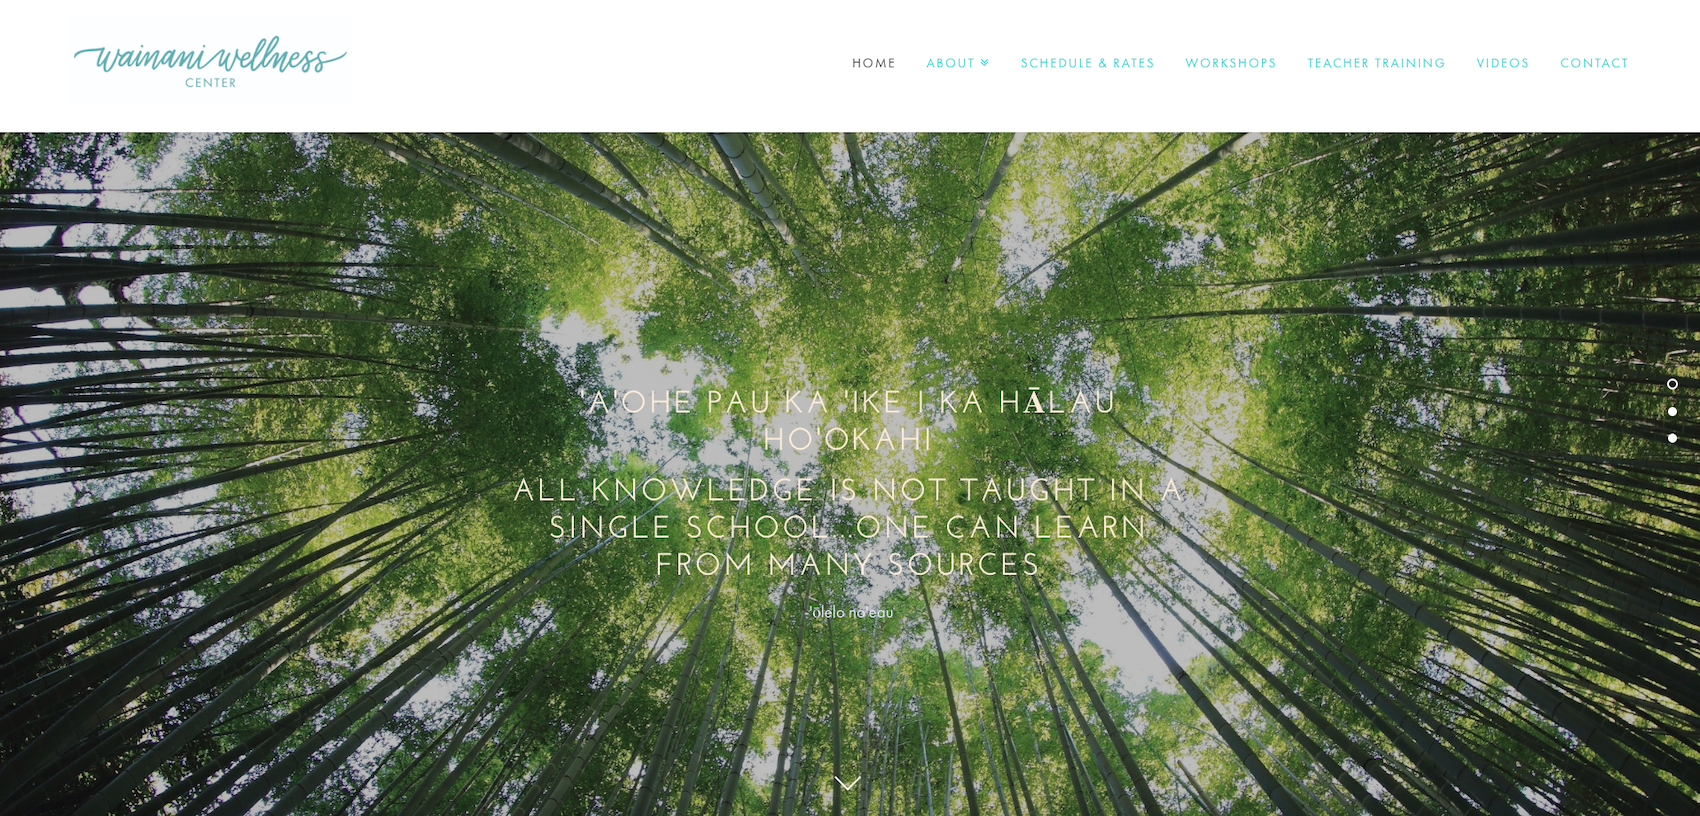 Wainani Wellness - Site Setup, Customization, Image Curation, Management